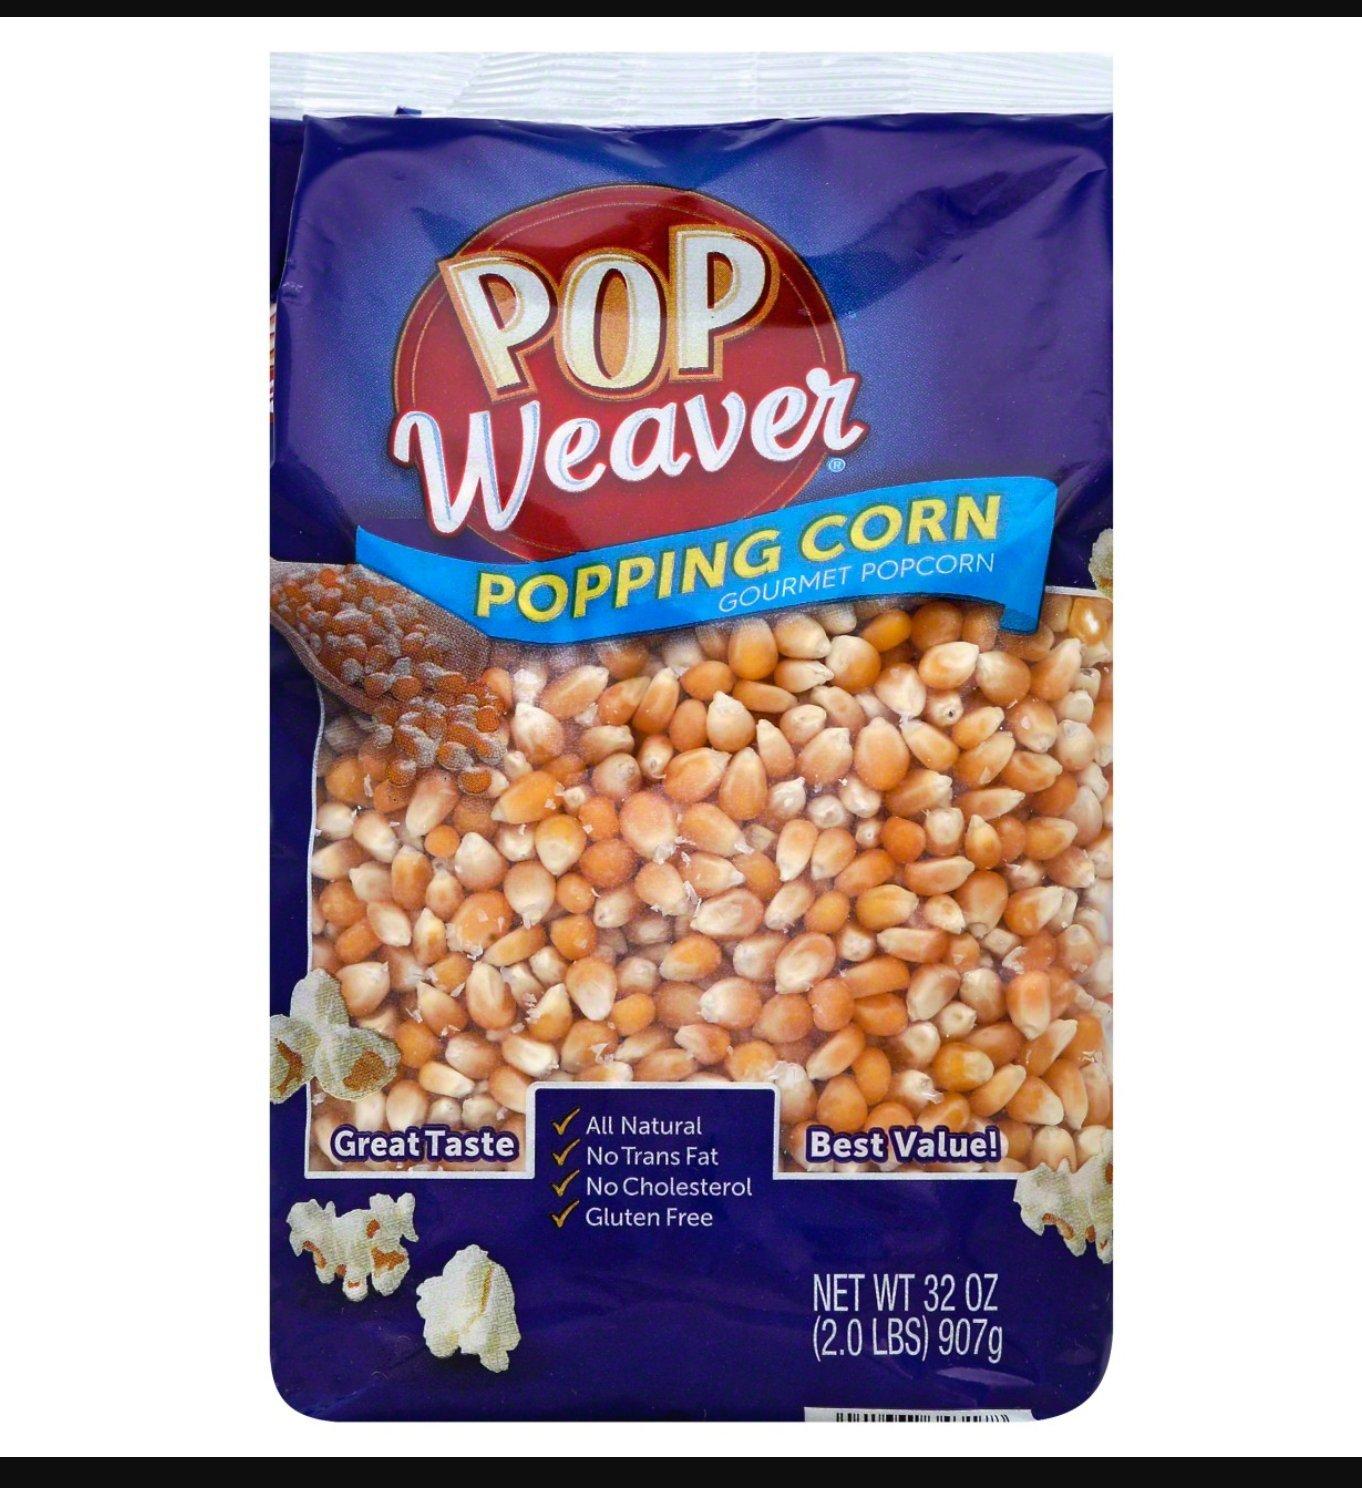 Pop Weaver Popping Corn - 2 Pound Bag